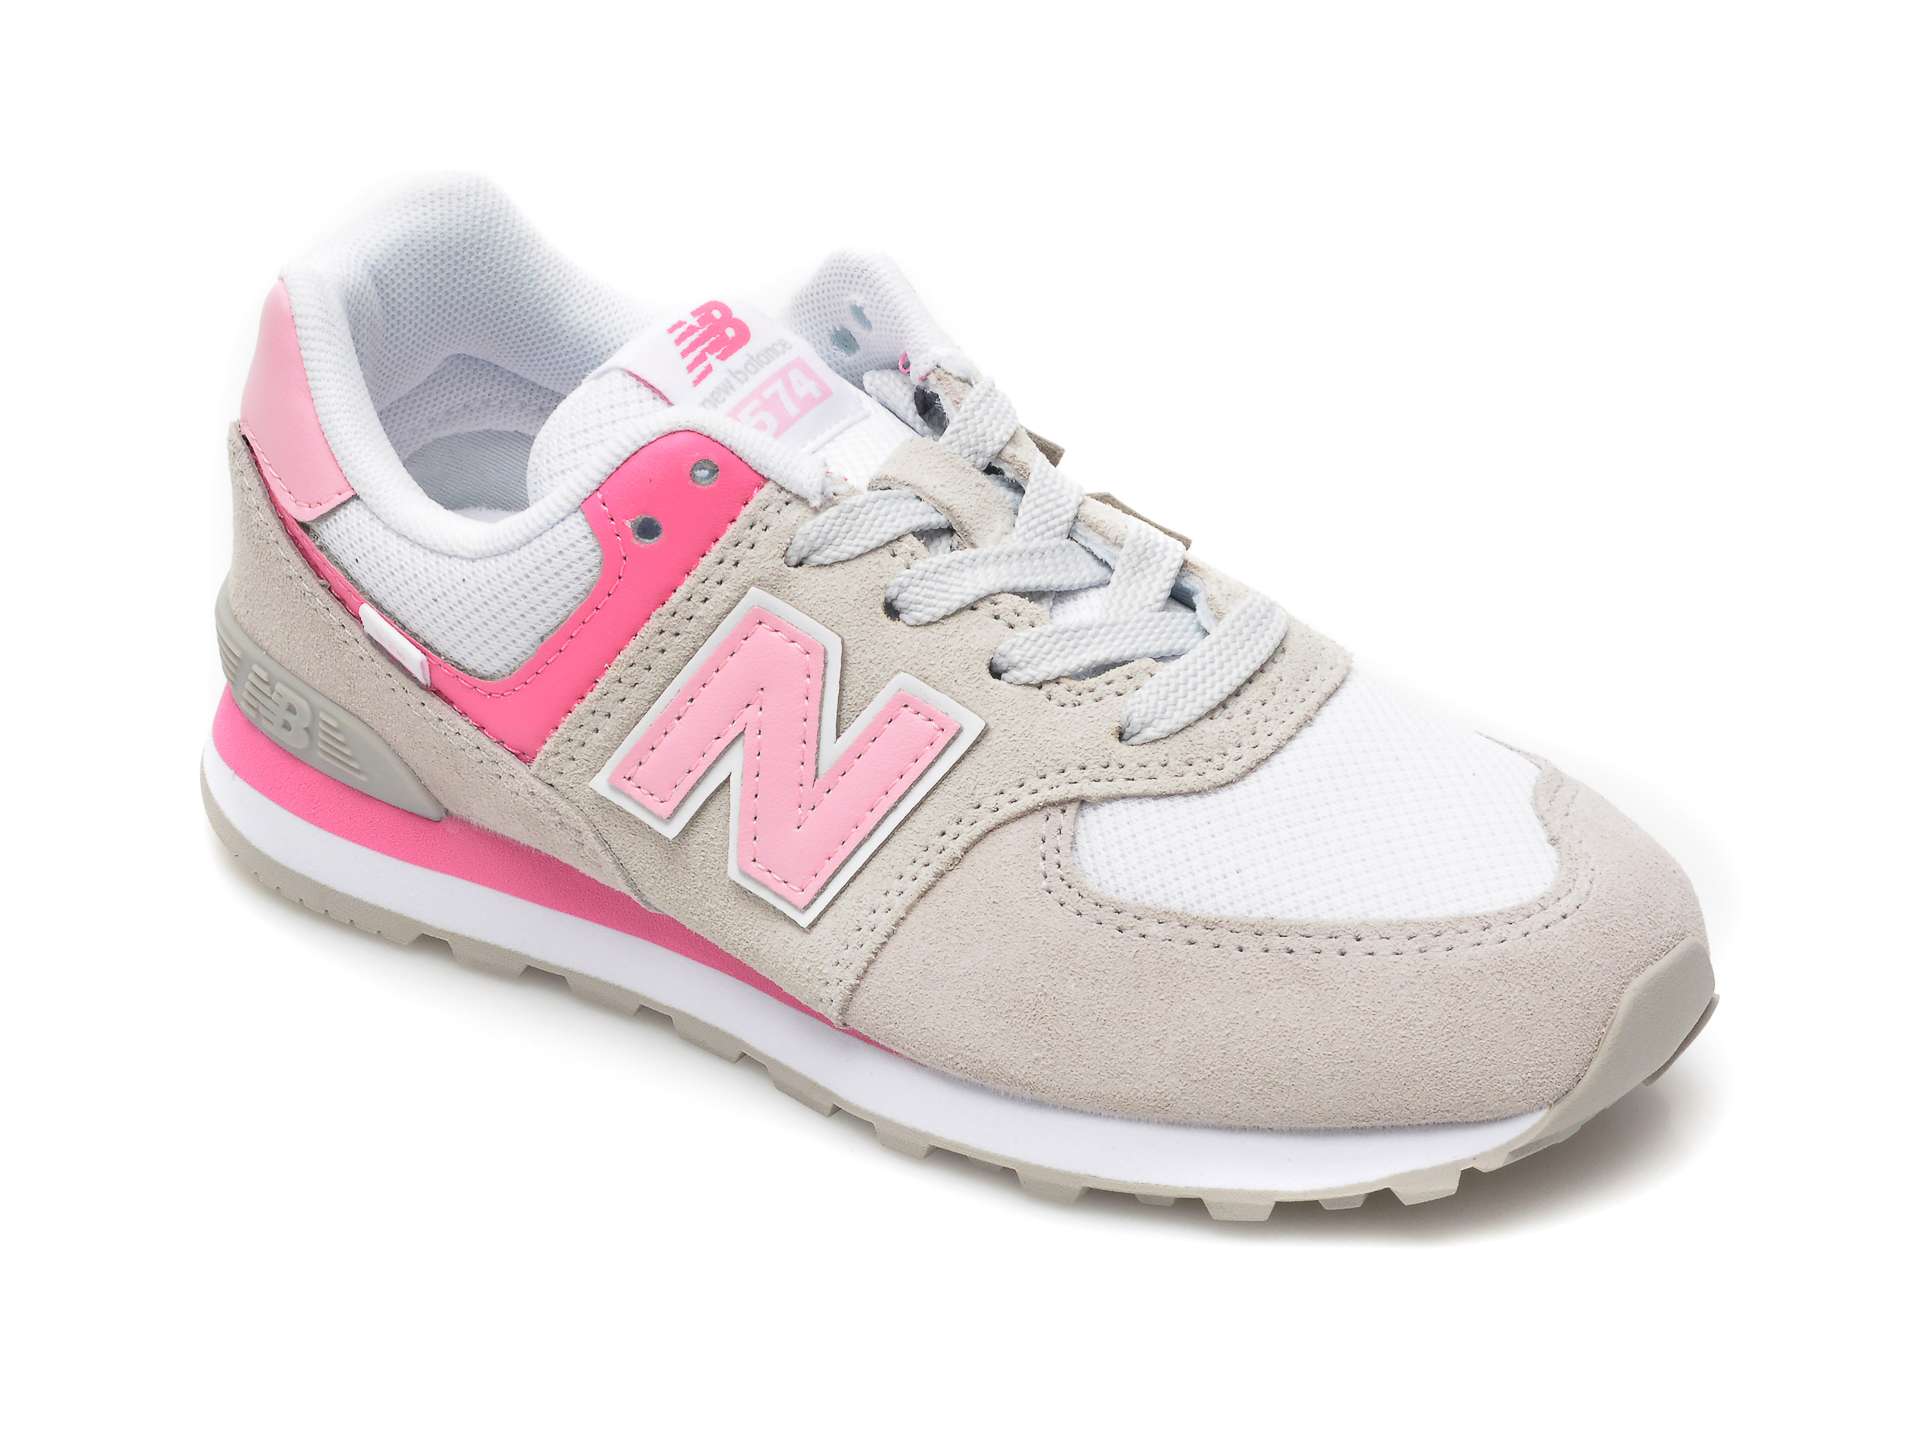 Pantofi sport NEW BALANCE gri, PC574, din material textil si piele intoarsa